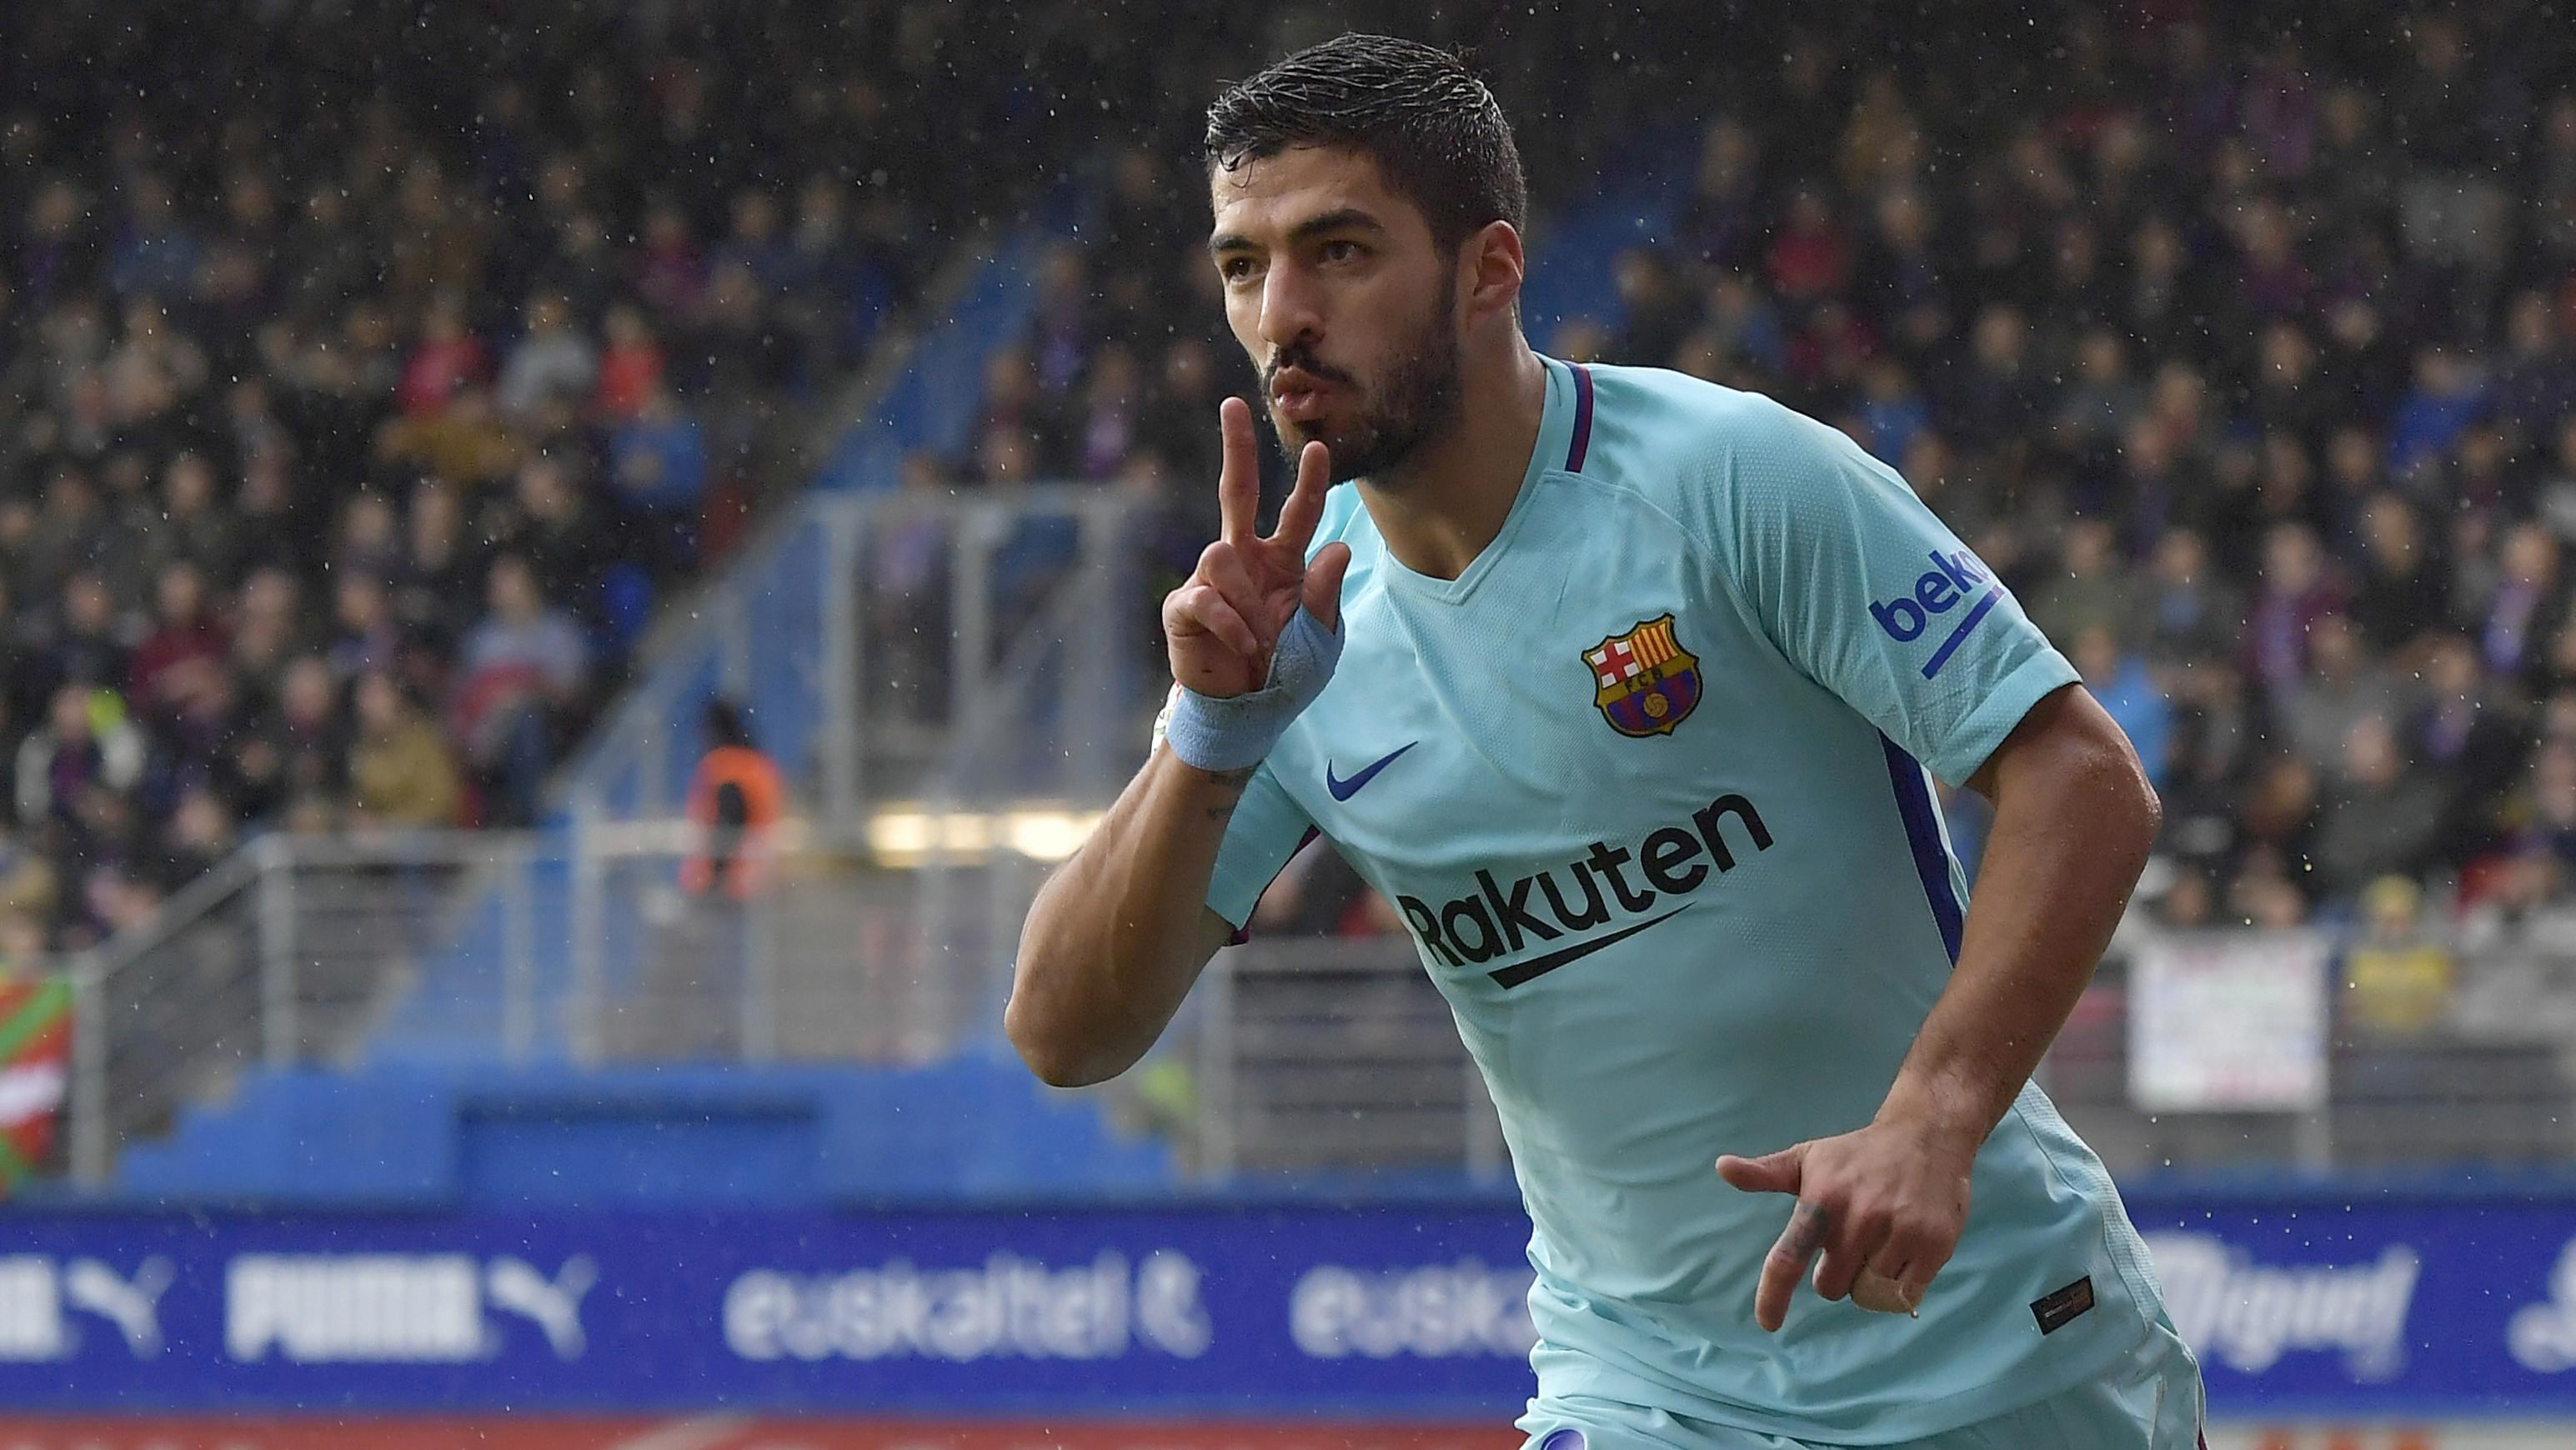 Ekspresi pemain FC Barcelona, Luis Suarez usai membobol gawang Eibar pada lanjutan La Liga Santander di Ipurua stadium,  Eibar, (17/2/2018). Barcelona menang 2-0.(AP/Alvaro Barrientos)